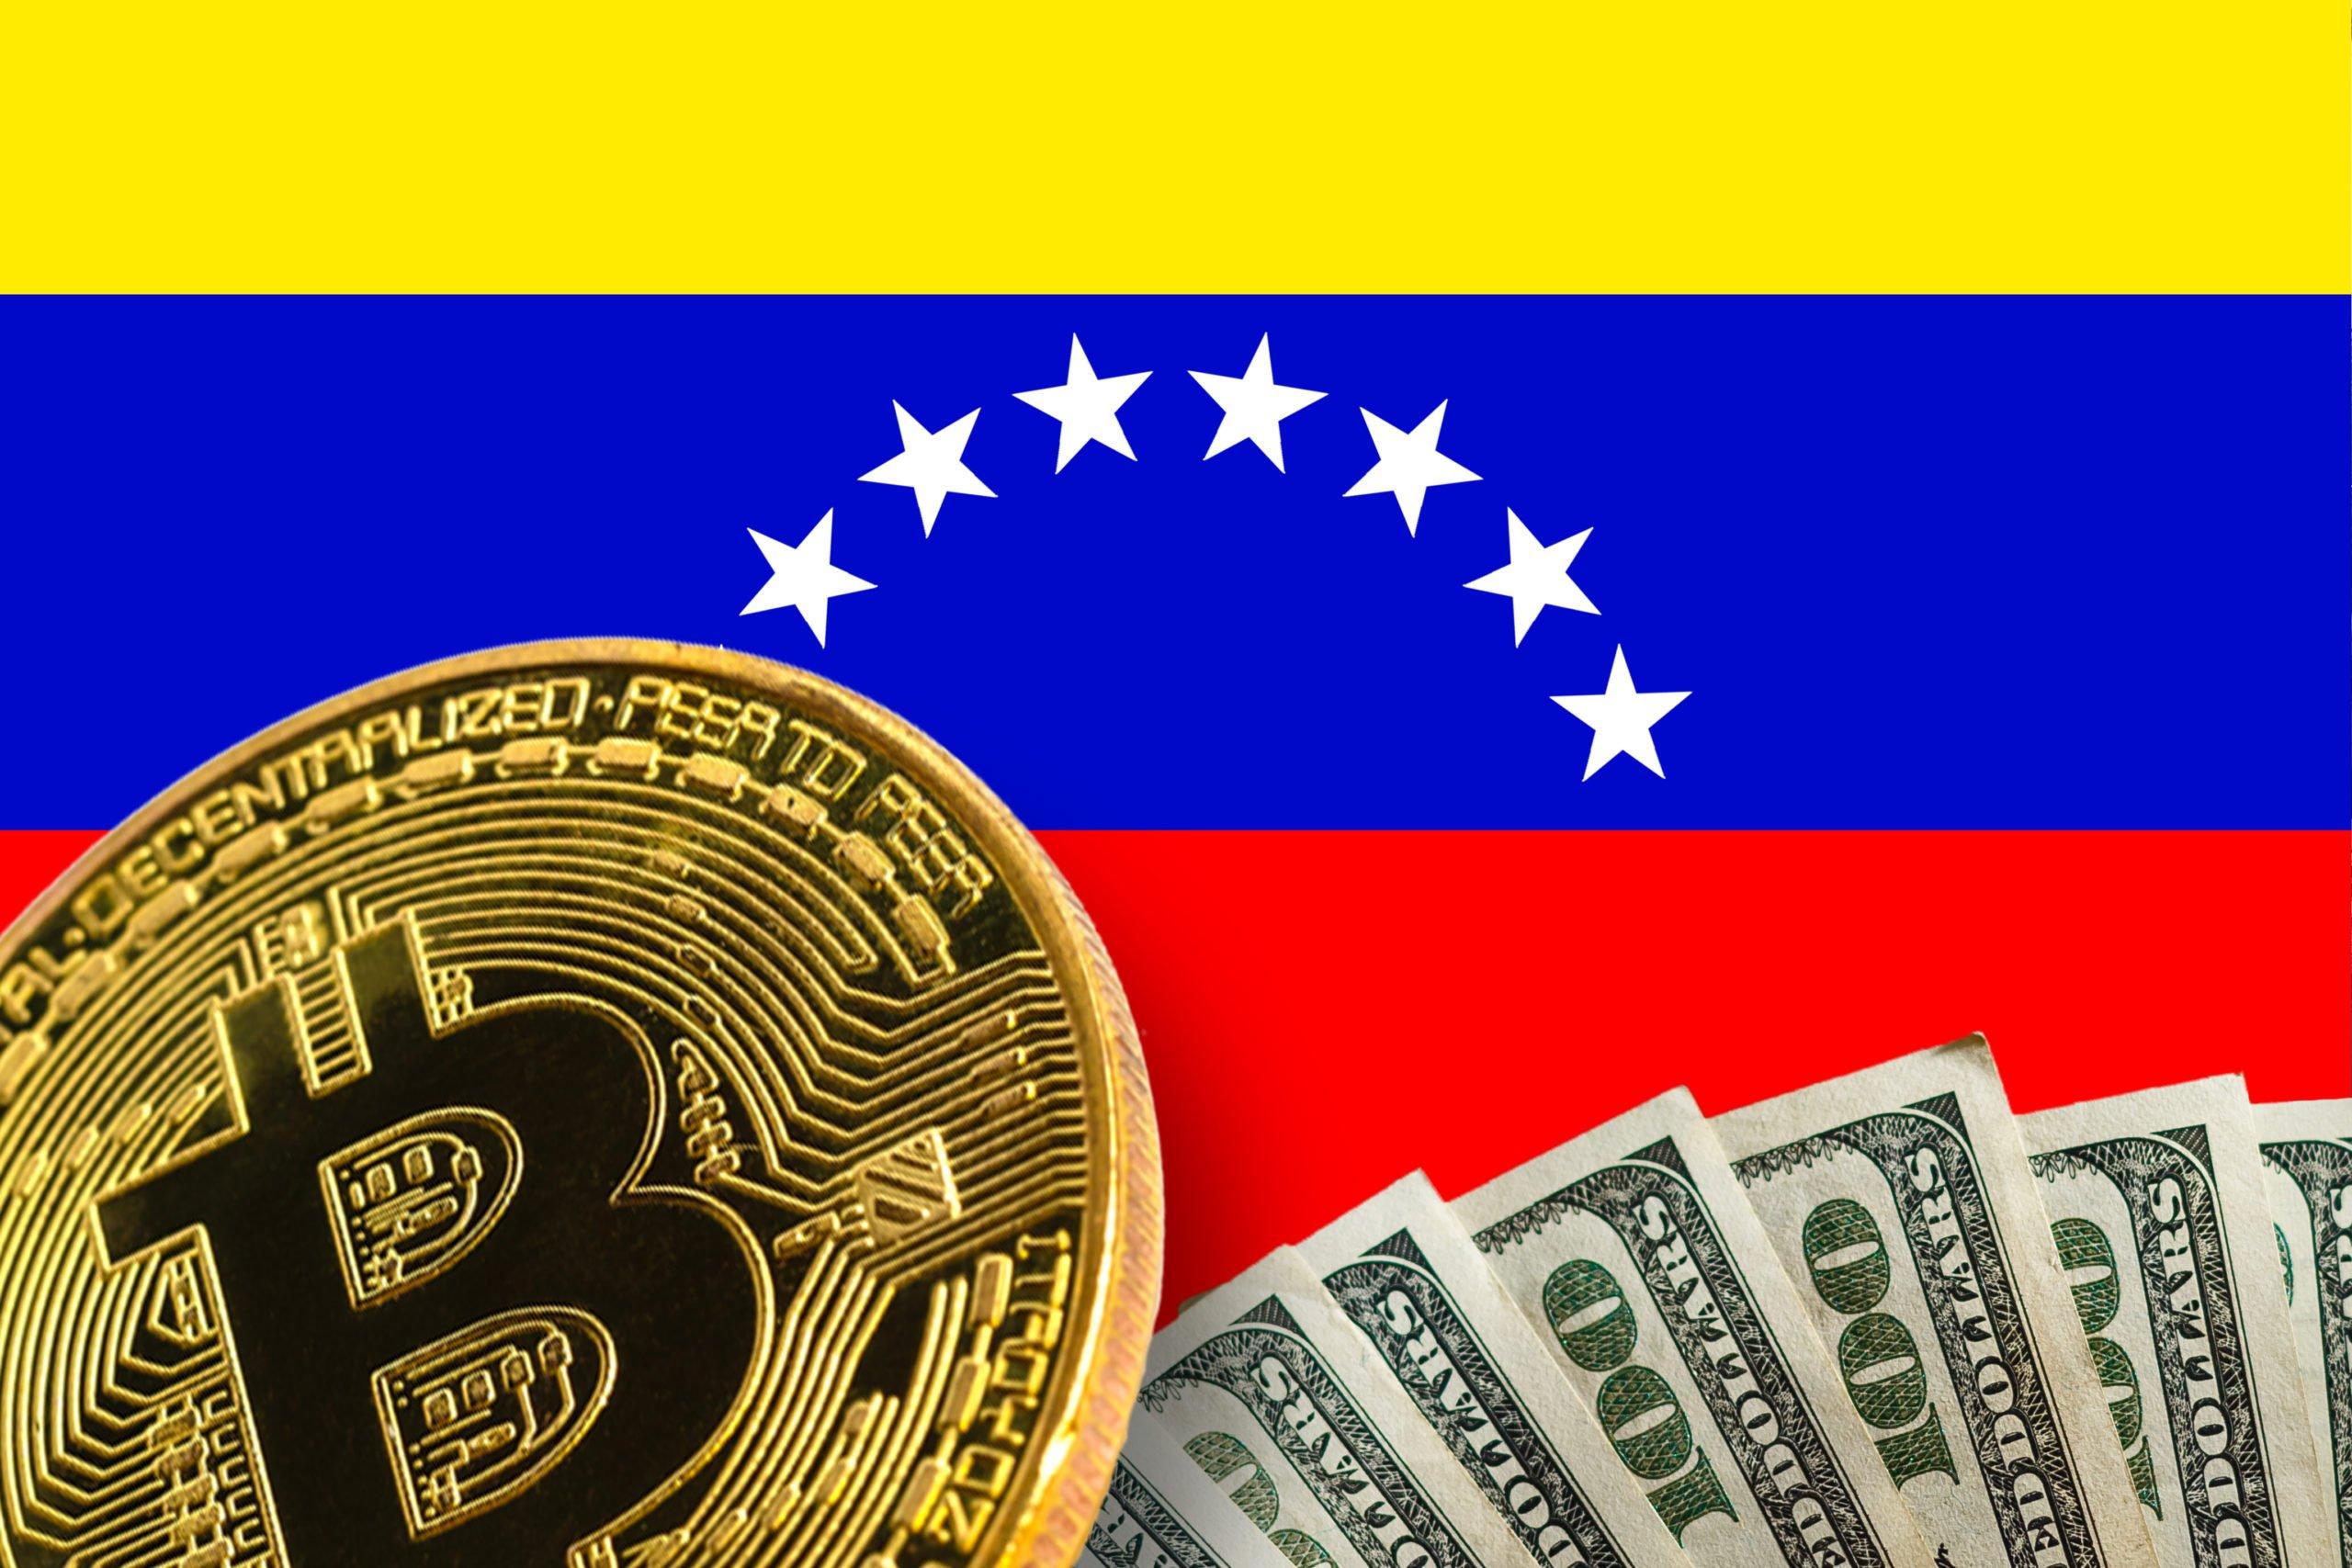 bitcoin venezuela oil tanker supply shutterstock_789254620